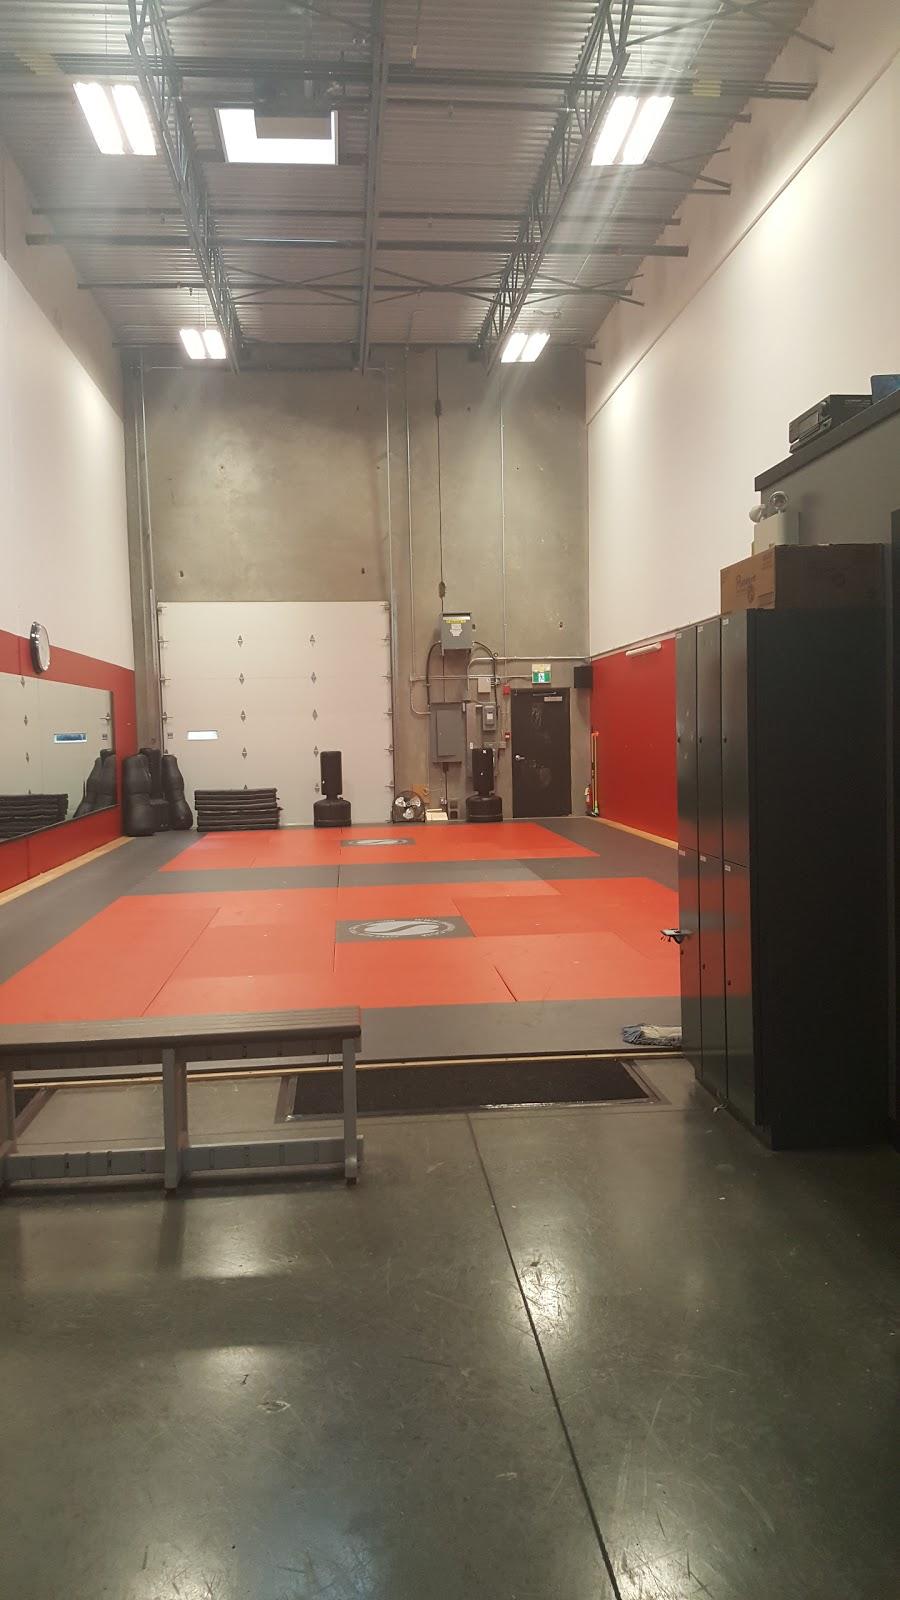 Fremont Martial Arts Training Centre | health | 551 Sherling Pl Unit #1150, Port Coquitlam, BC V3B 0J6, Canada | 6046573584 OR +1 604-657-3584